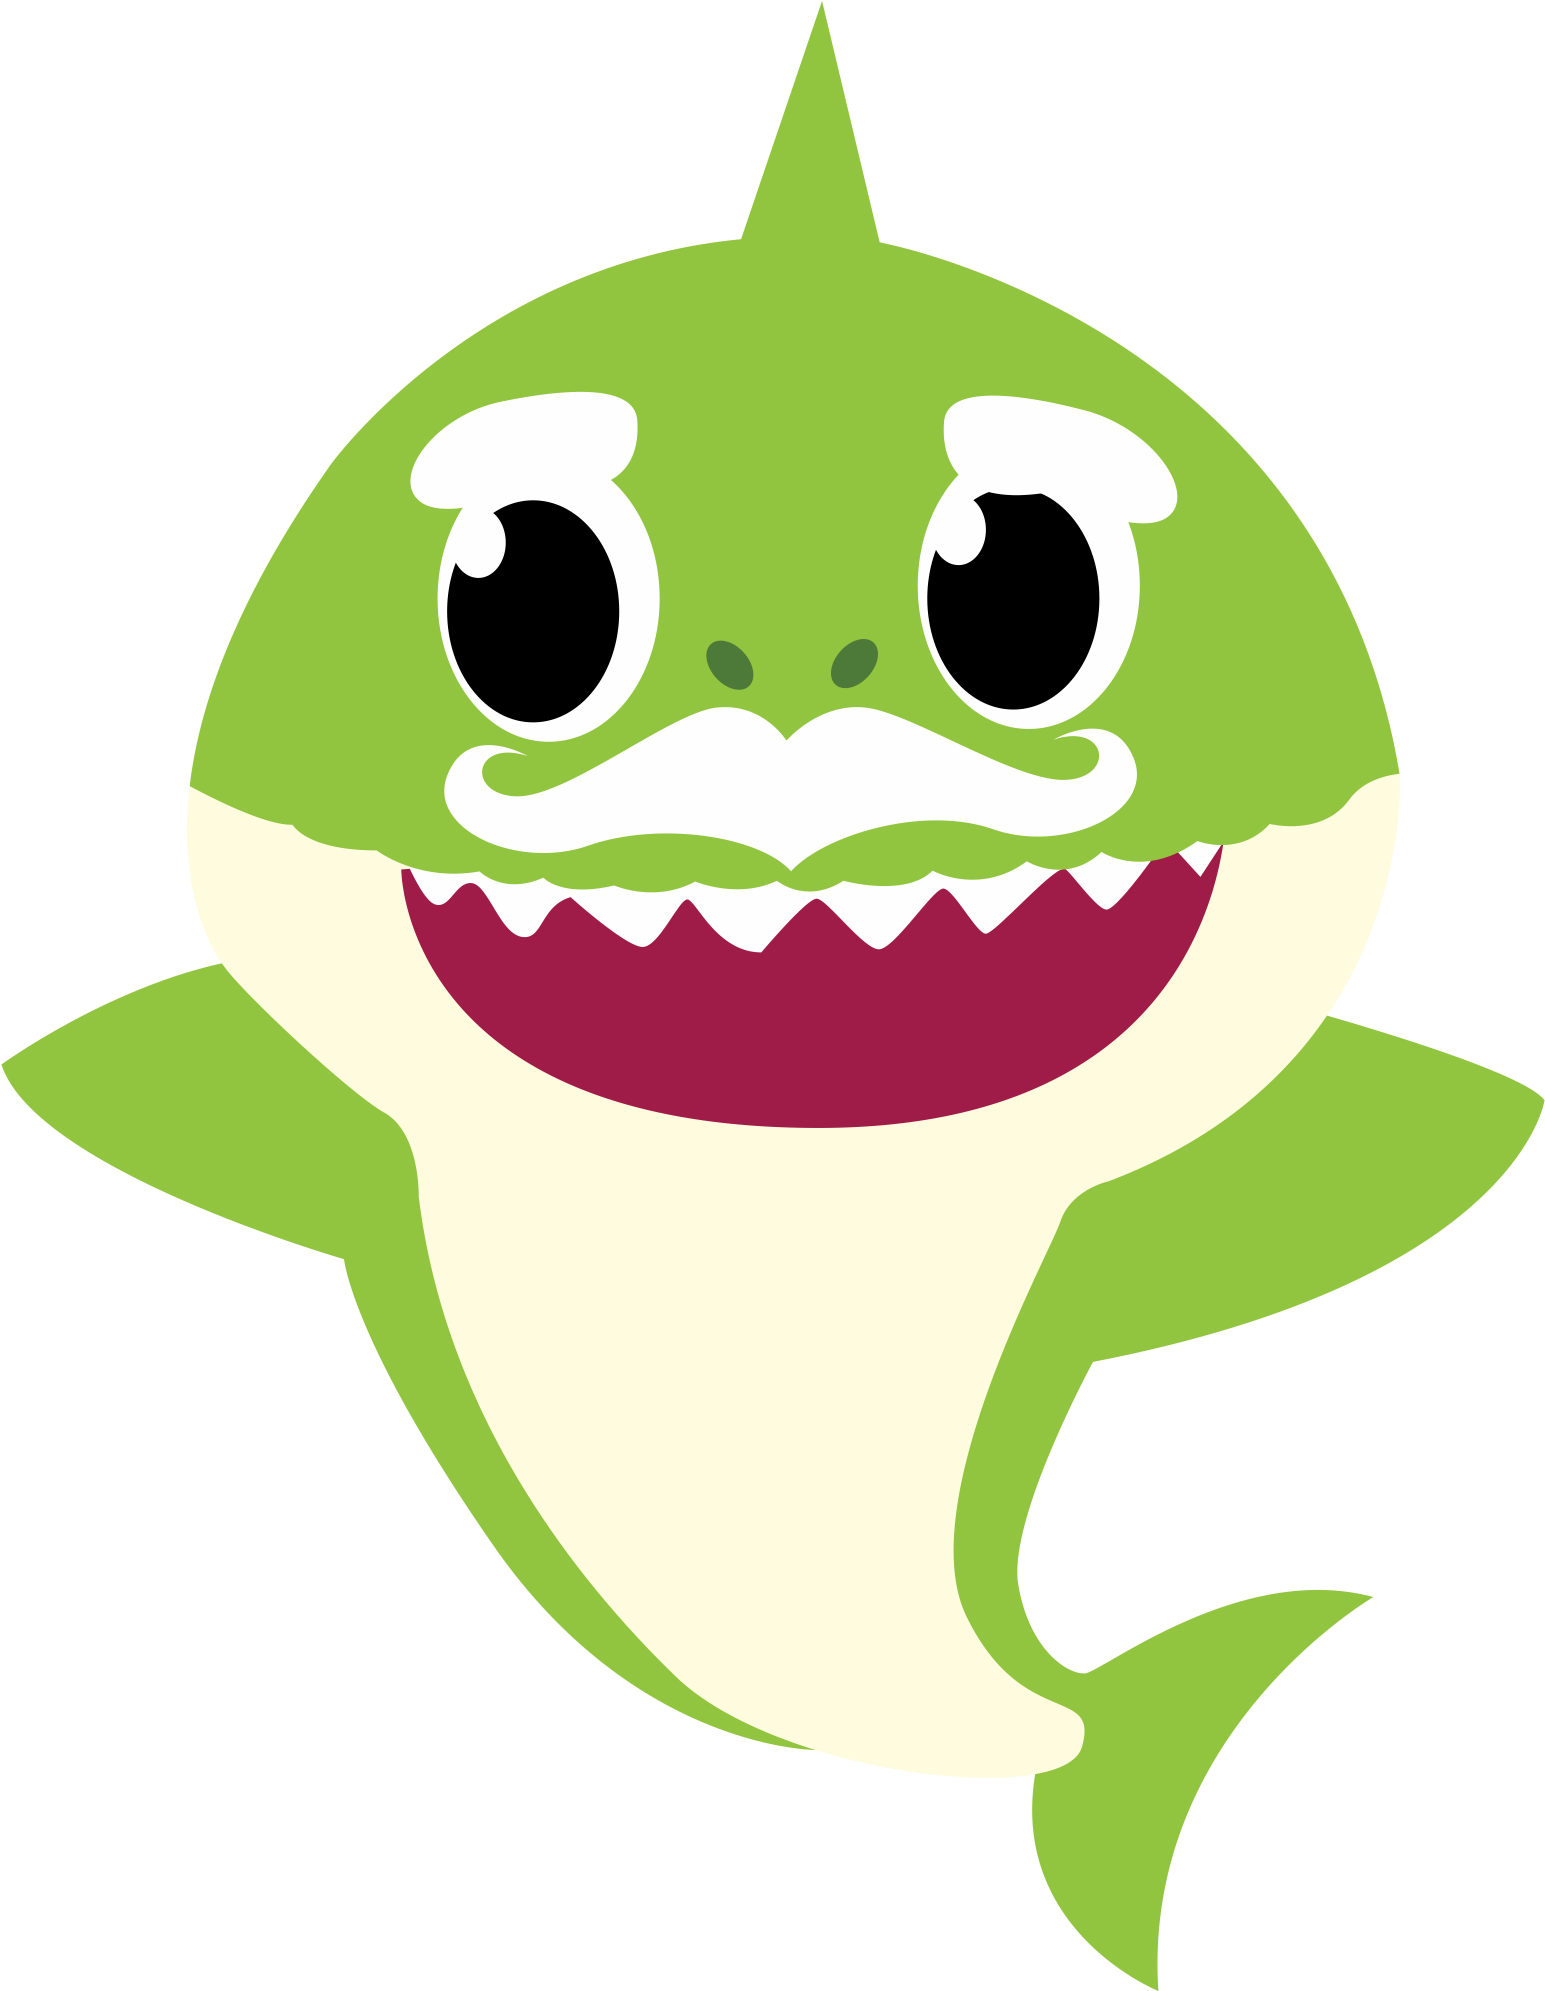 Free 1st Baby Shark Ft Jauz Invitation Templates Thank You Card Baby Shark Baby Shark Doo Doo Shark Theme Birthday